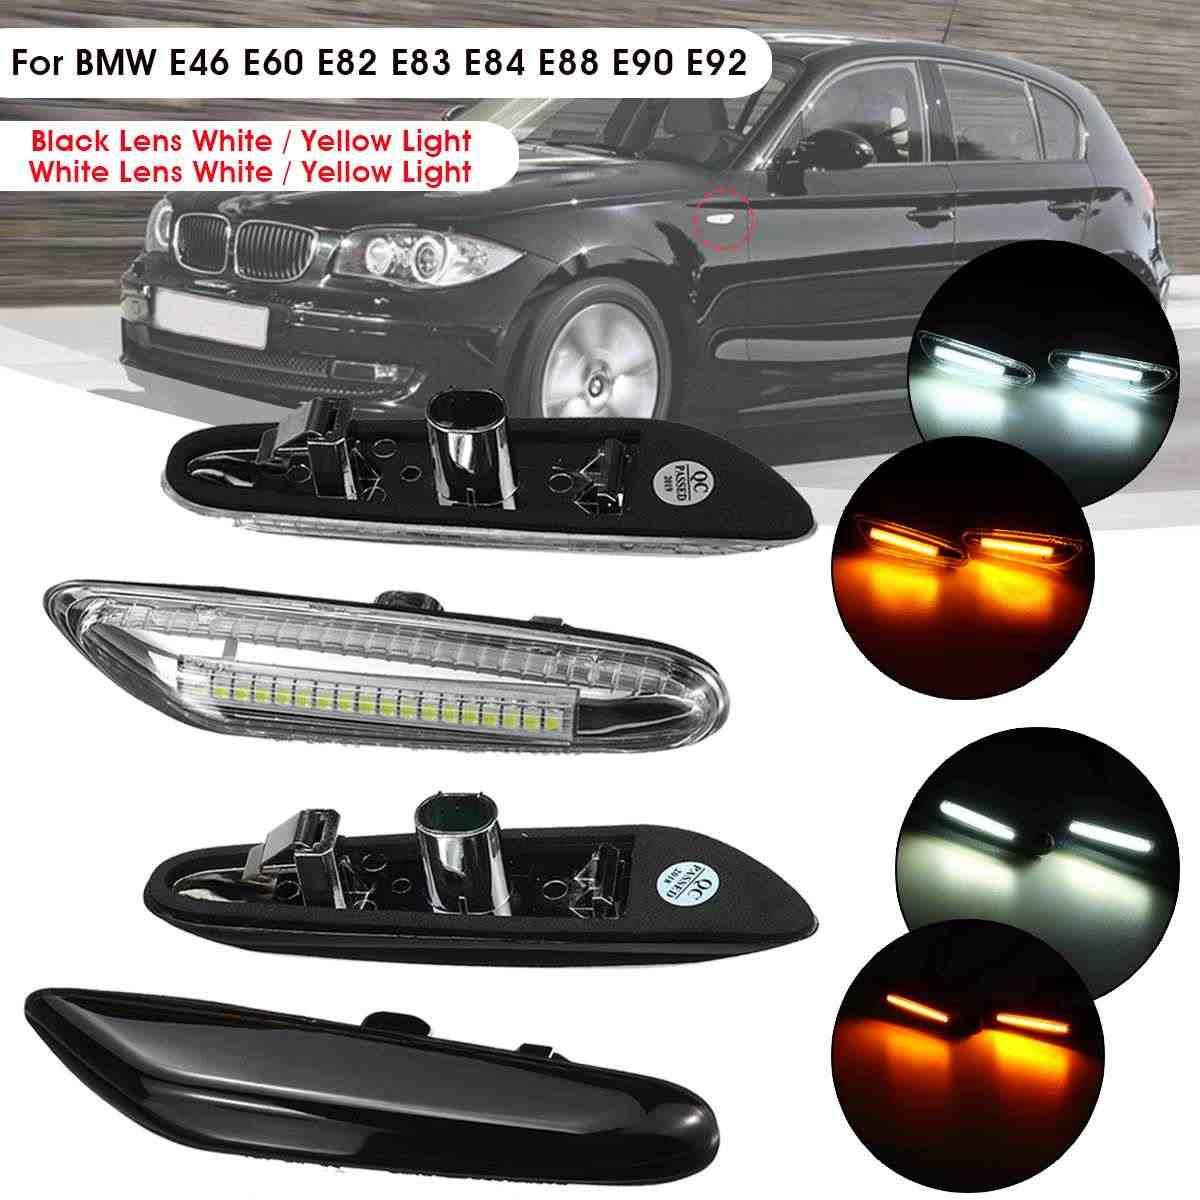 Black Pair Dynamic Side Marker Indicator Lights for B-MW E46 E60 E82 E88 E90 E92 E93